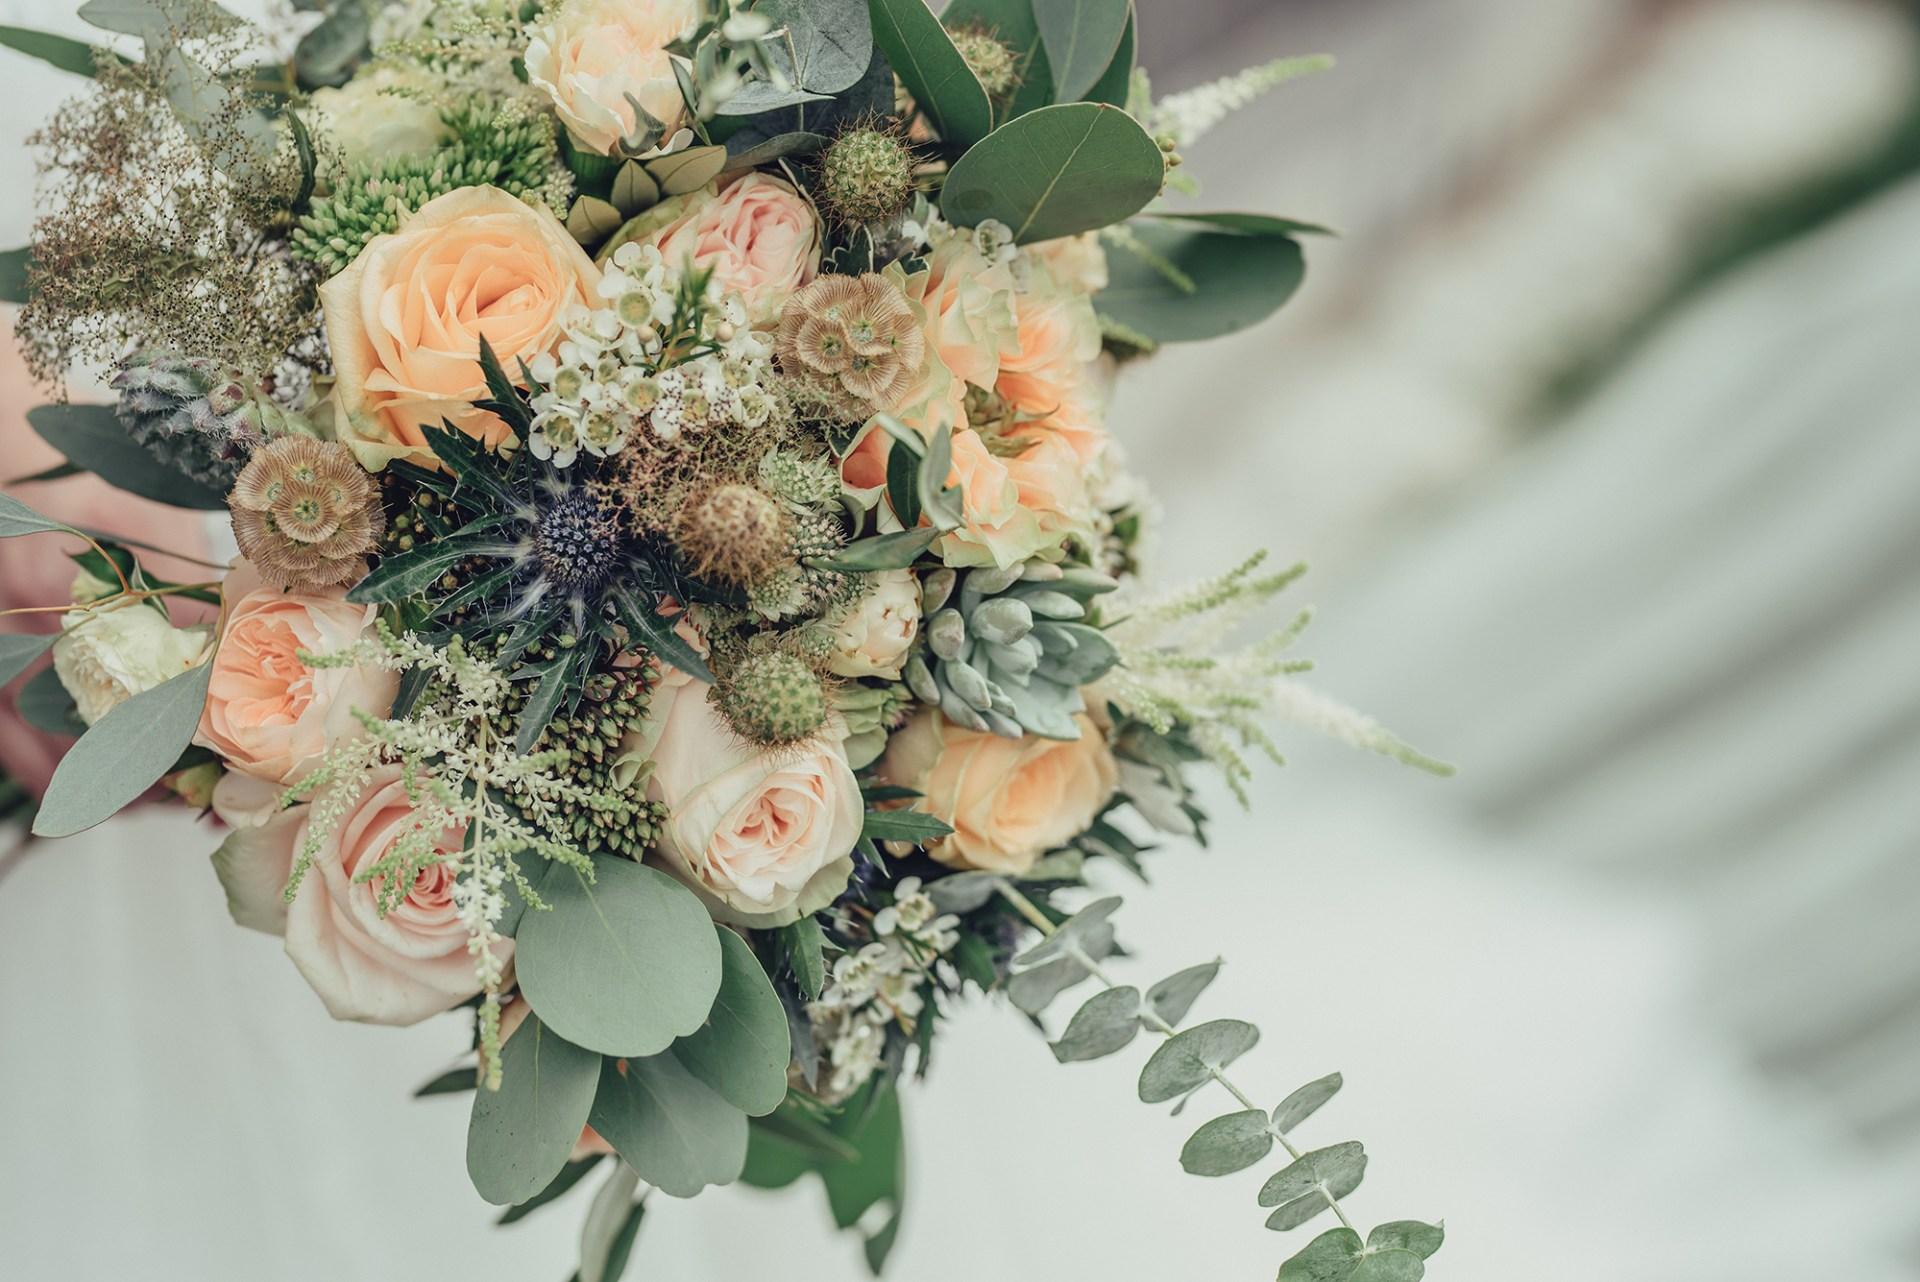 weddingseptemberluminoxx92348234141